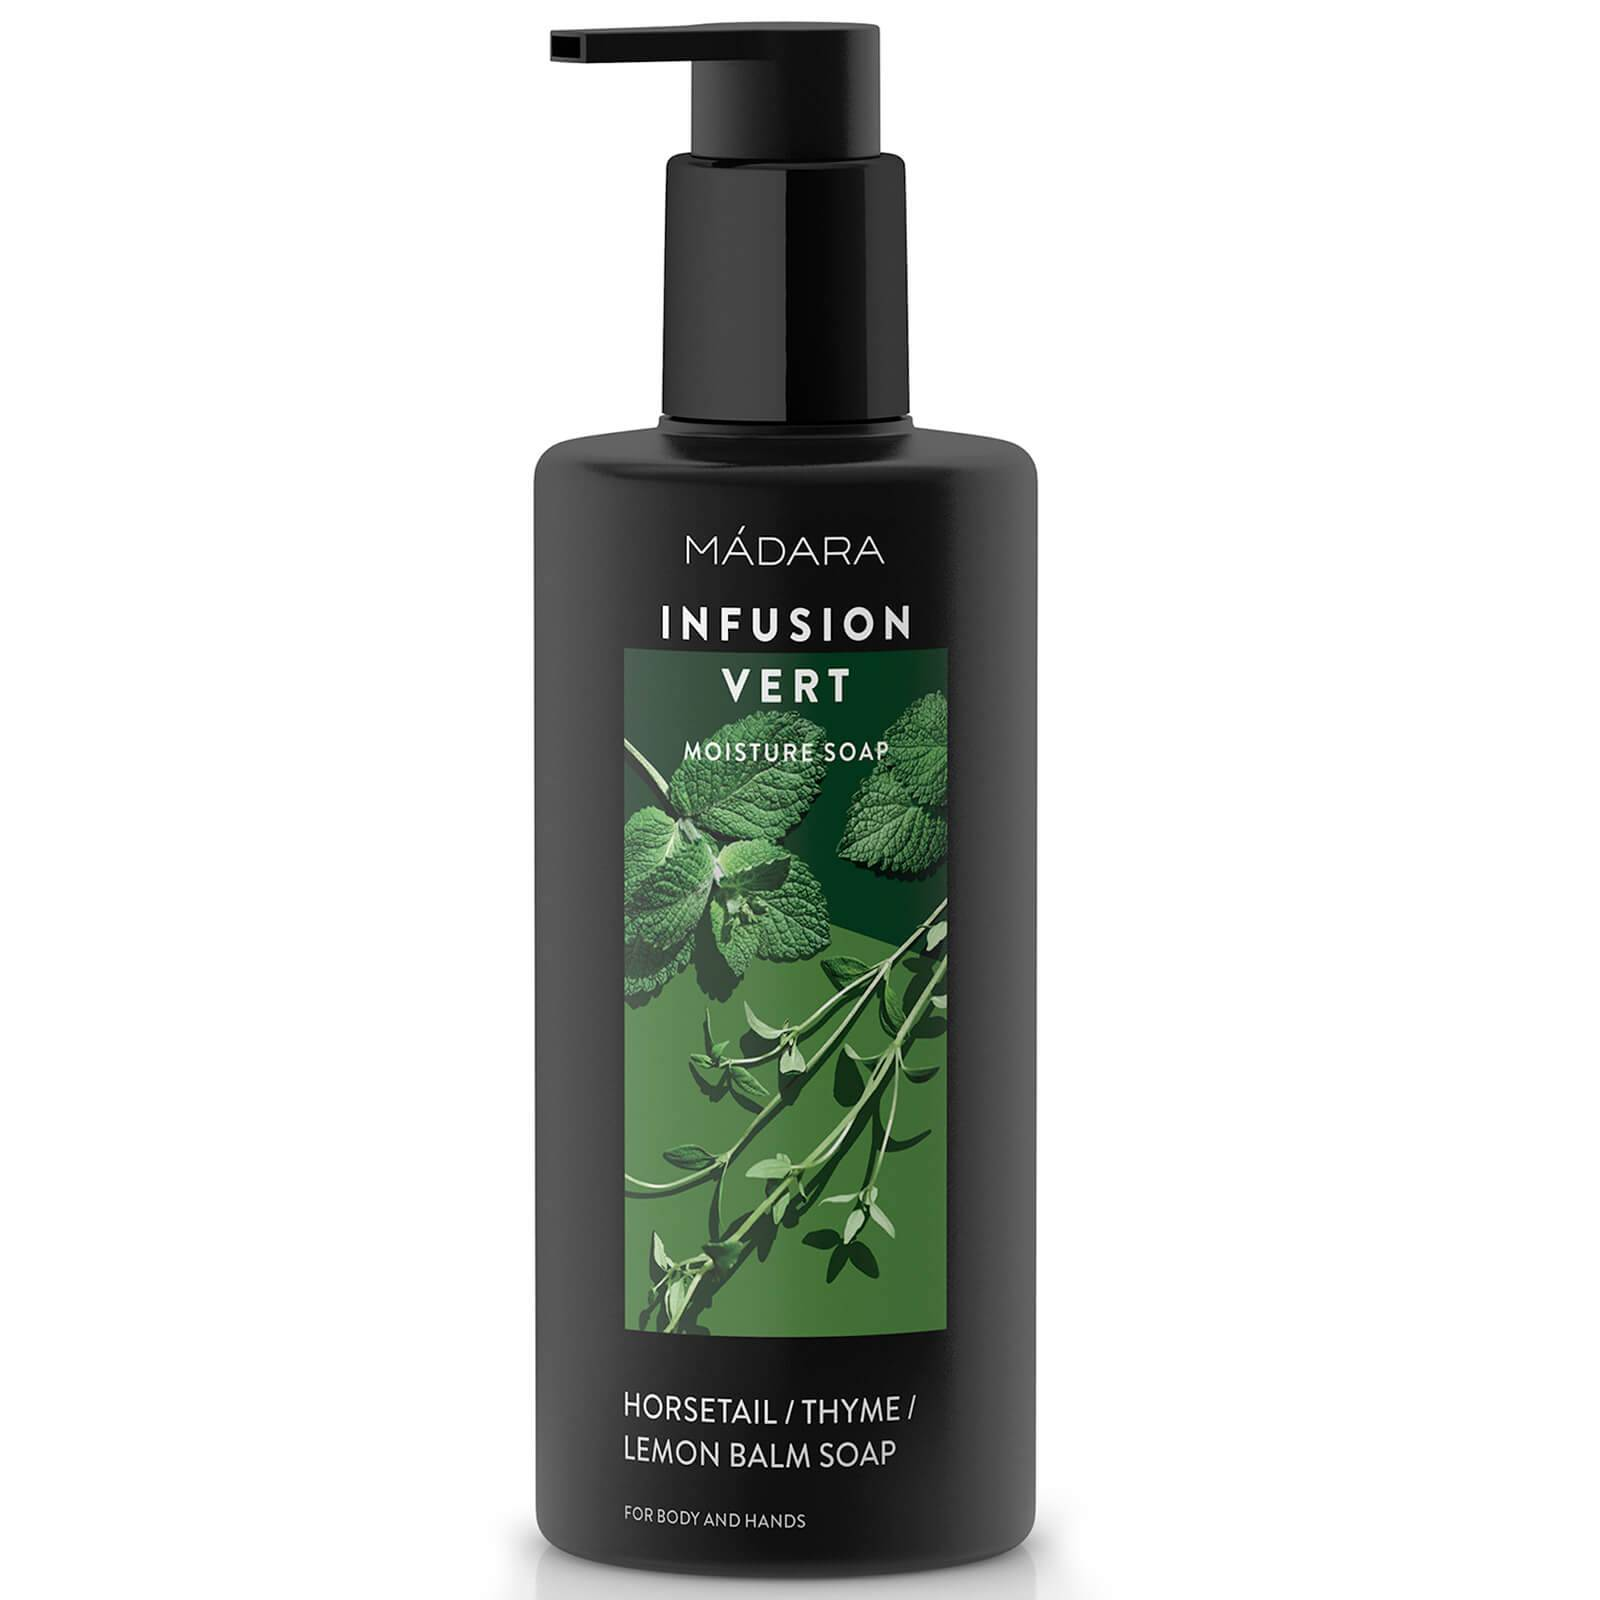 MADARA Savon Hydratant Infusion Vert (prêle, thym et mélisse) MÁDARA 300 ml